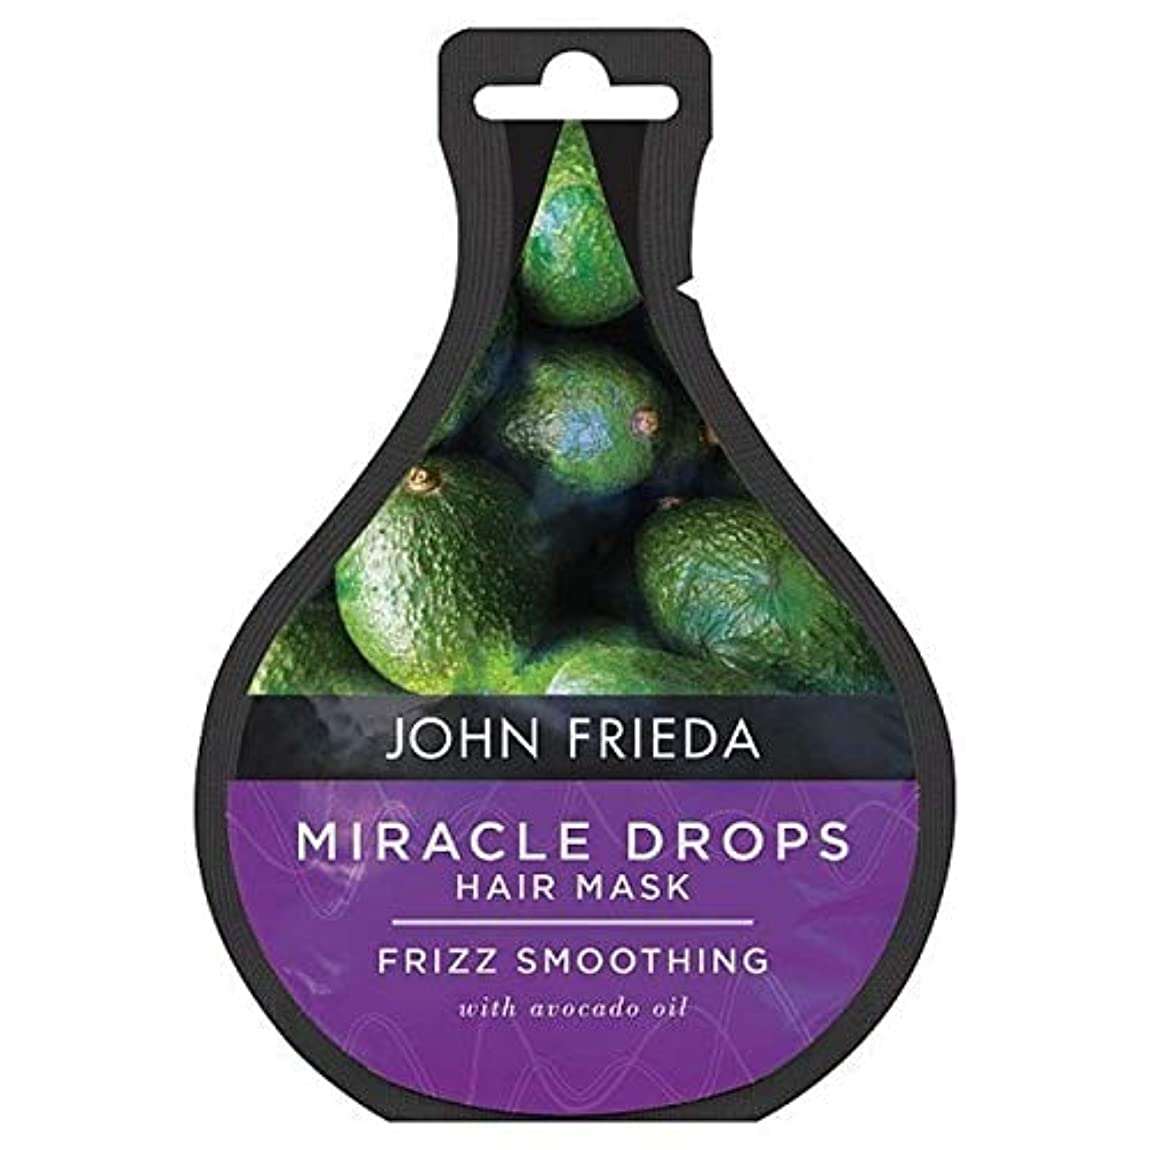 [John Frieda ] ジョン?フリーダ奇跡が縮れ容易に25ミリリットルのために低下し - John Frieda Miracle Drops for Frizz Ease 25ml [並行輸入品]